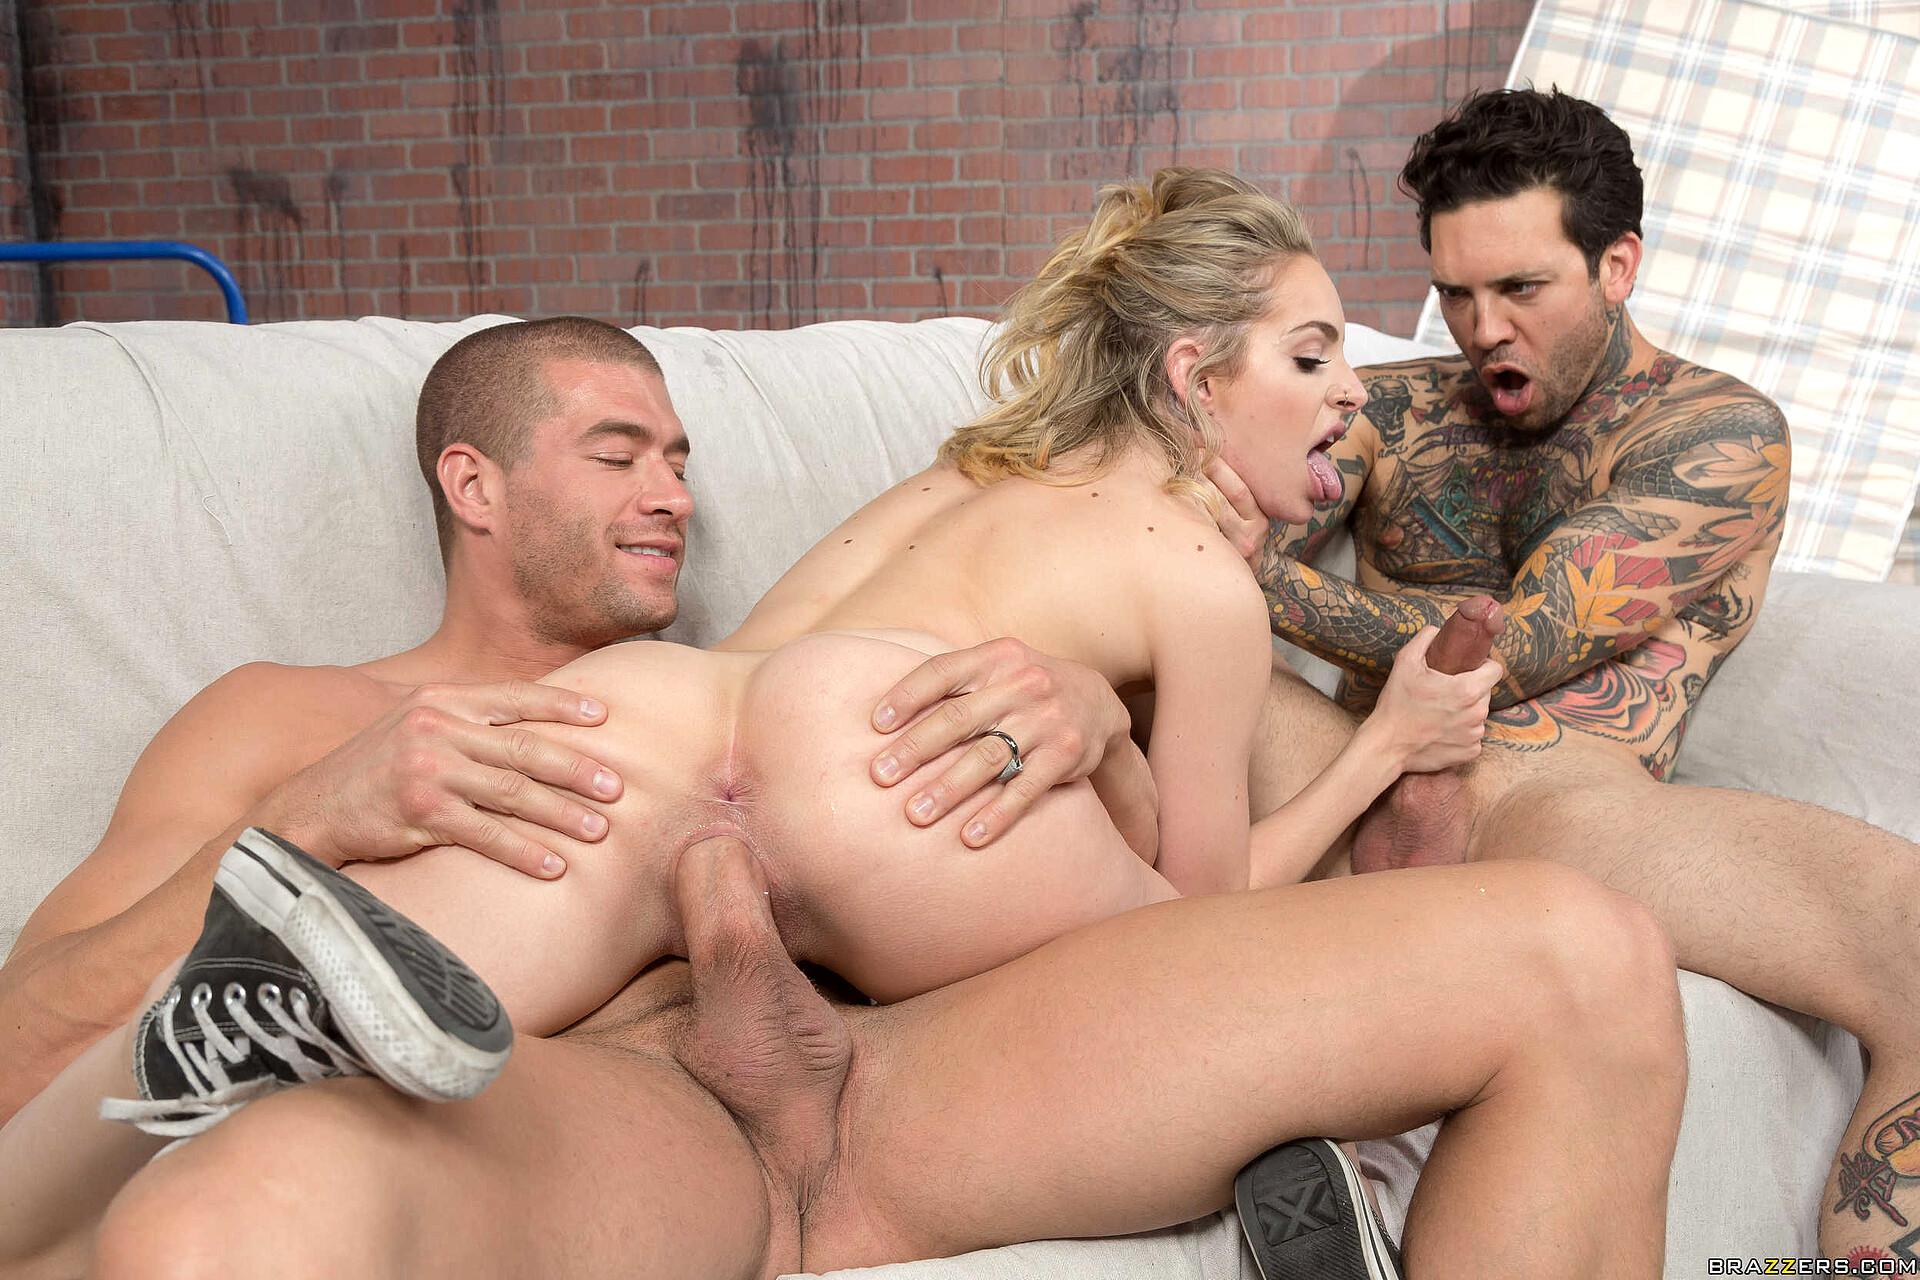 Naughty America Threesome Hd